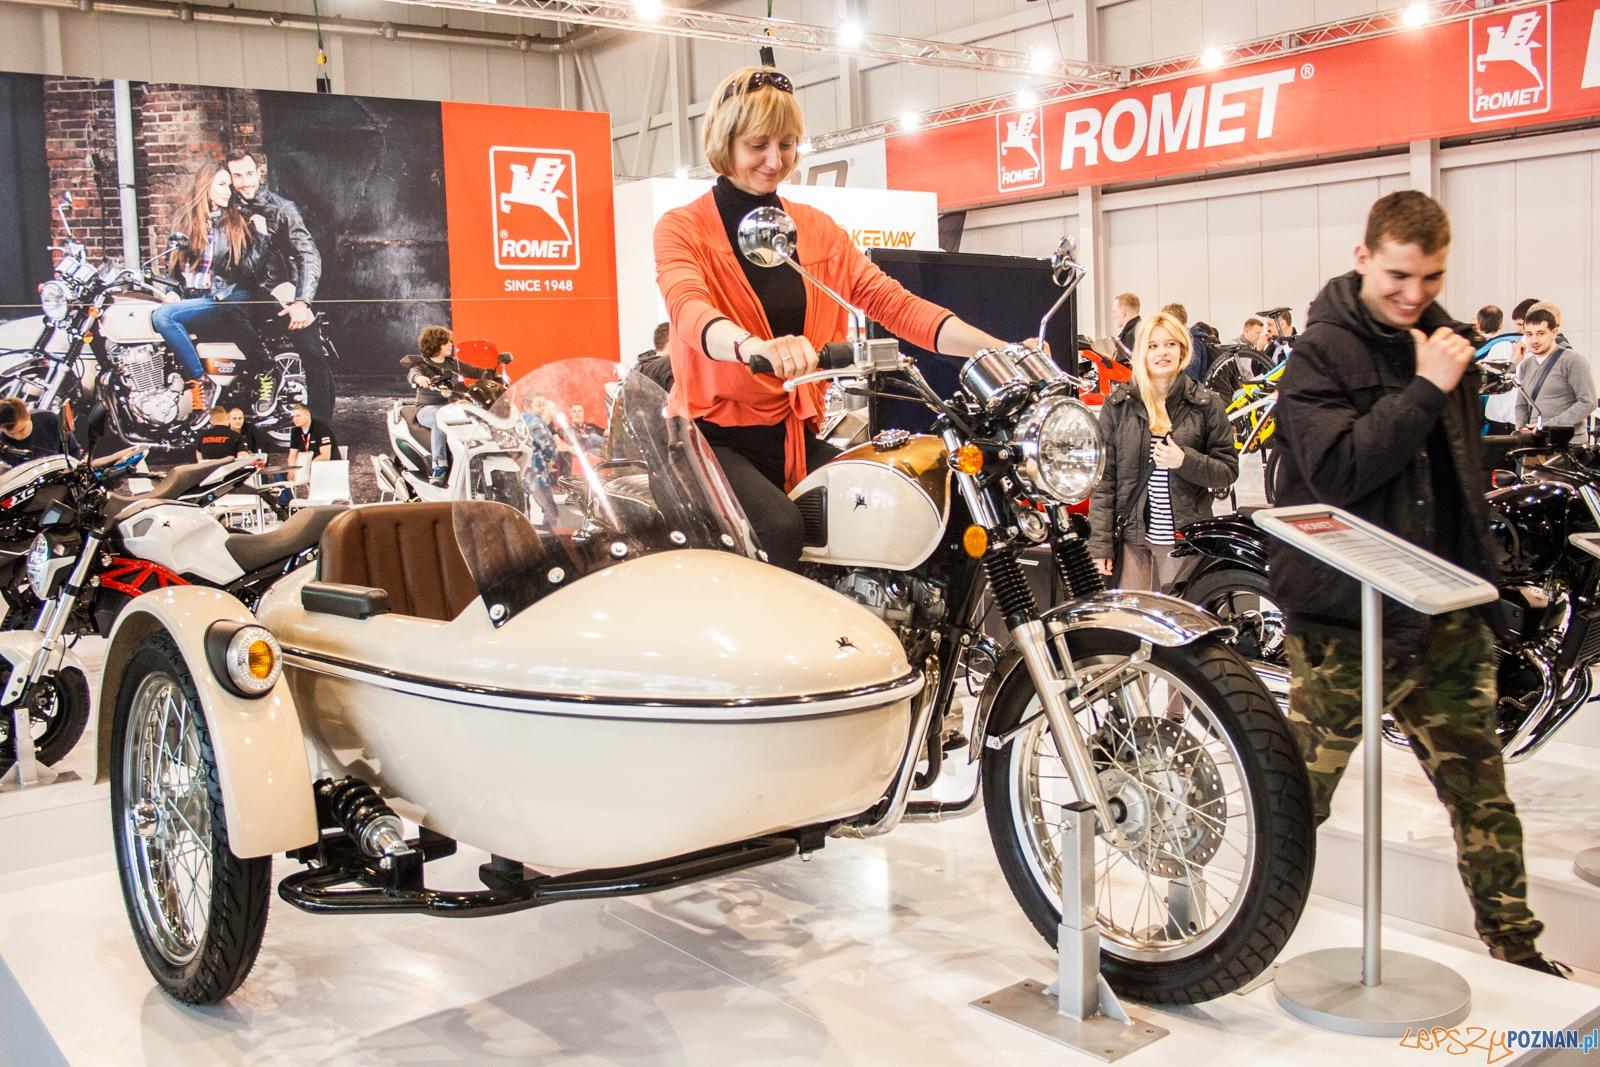 Motor Show 2016 (2.04.2016)  Foto: © lepszyPOZNAN.pl / Karolina Kiraga